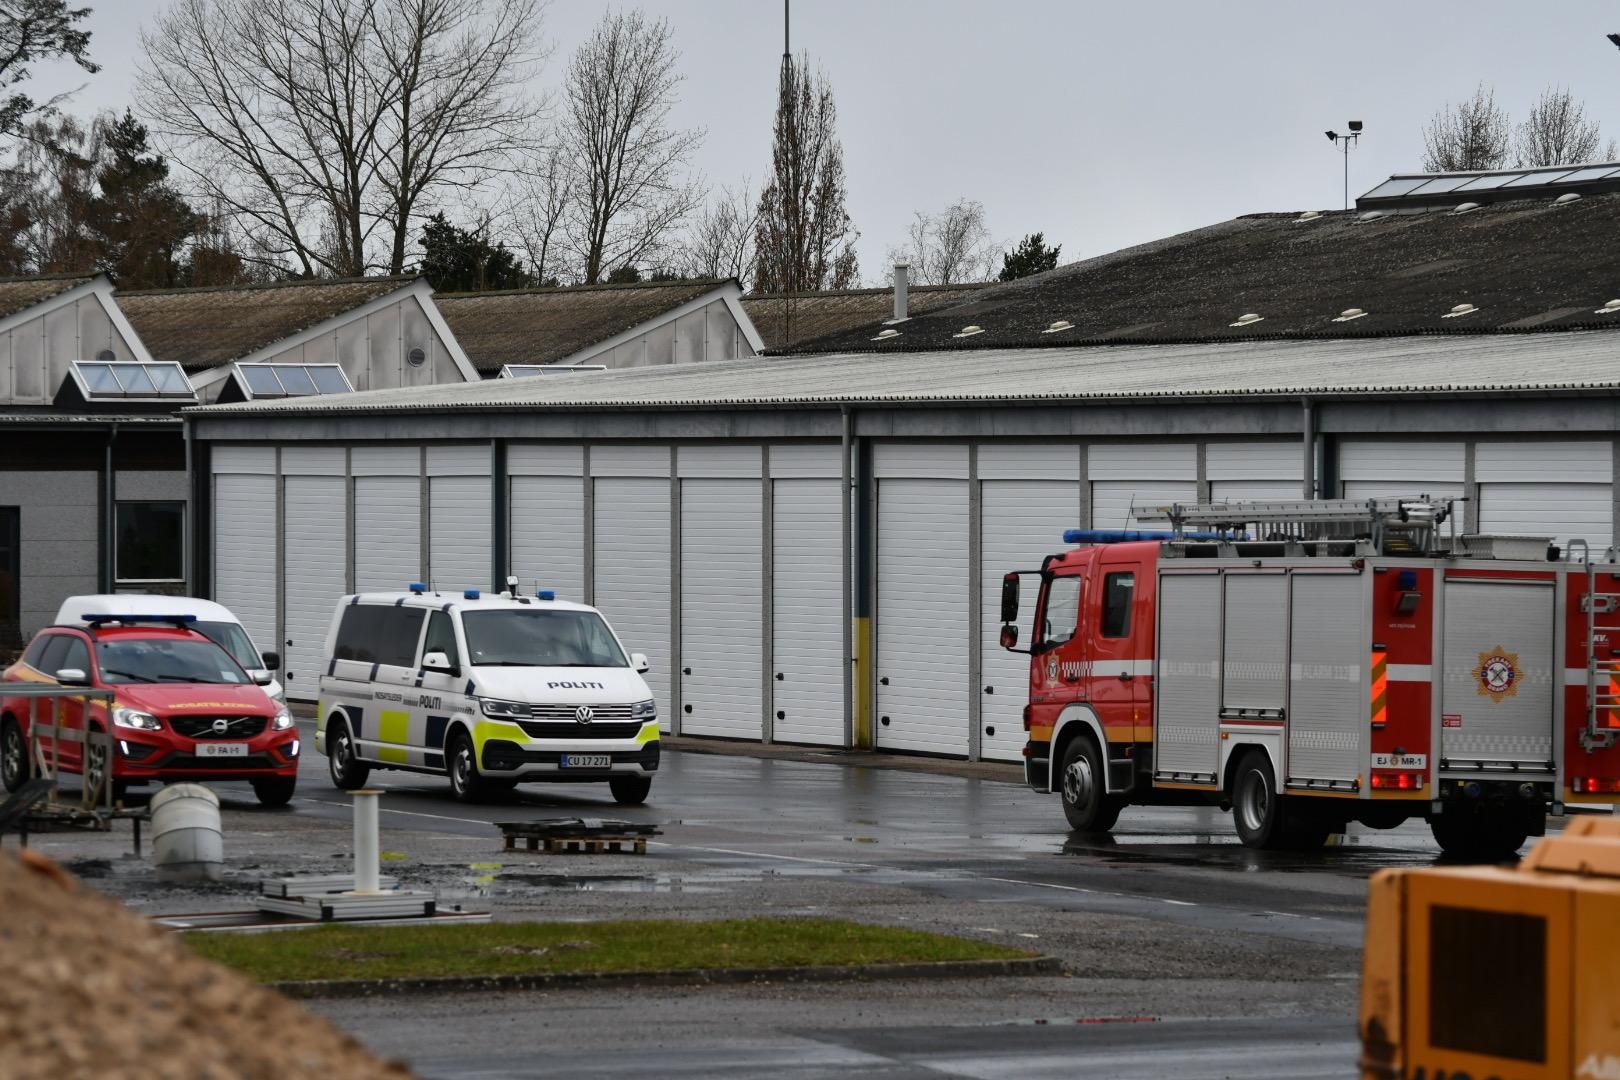 Brand i industribygning i Gelsted på Fyn